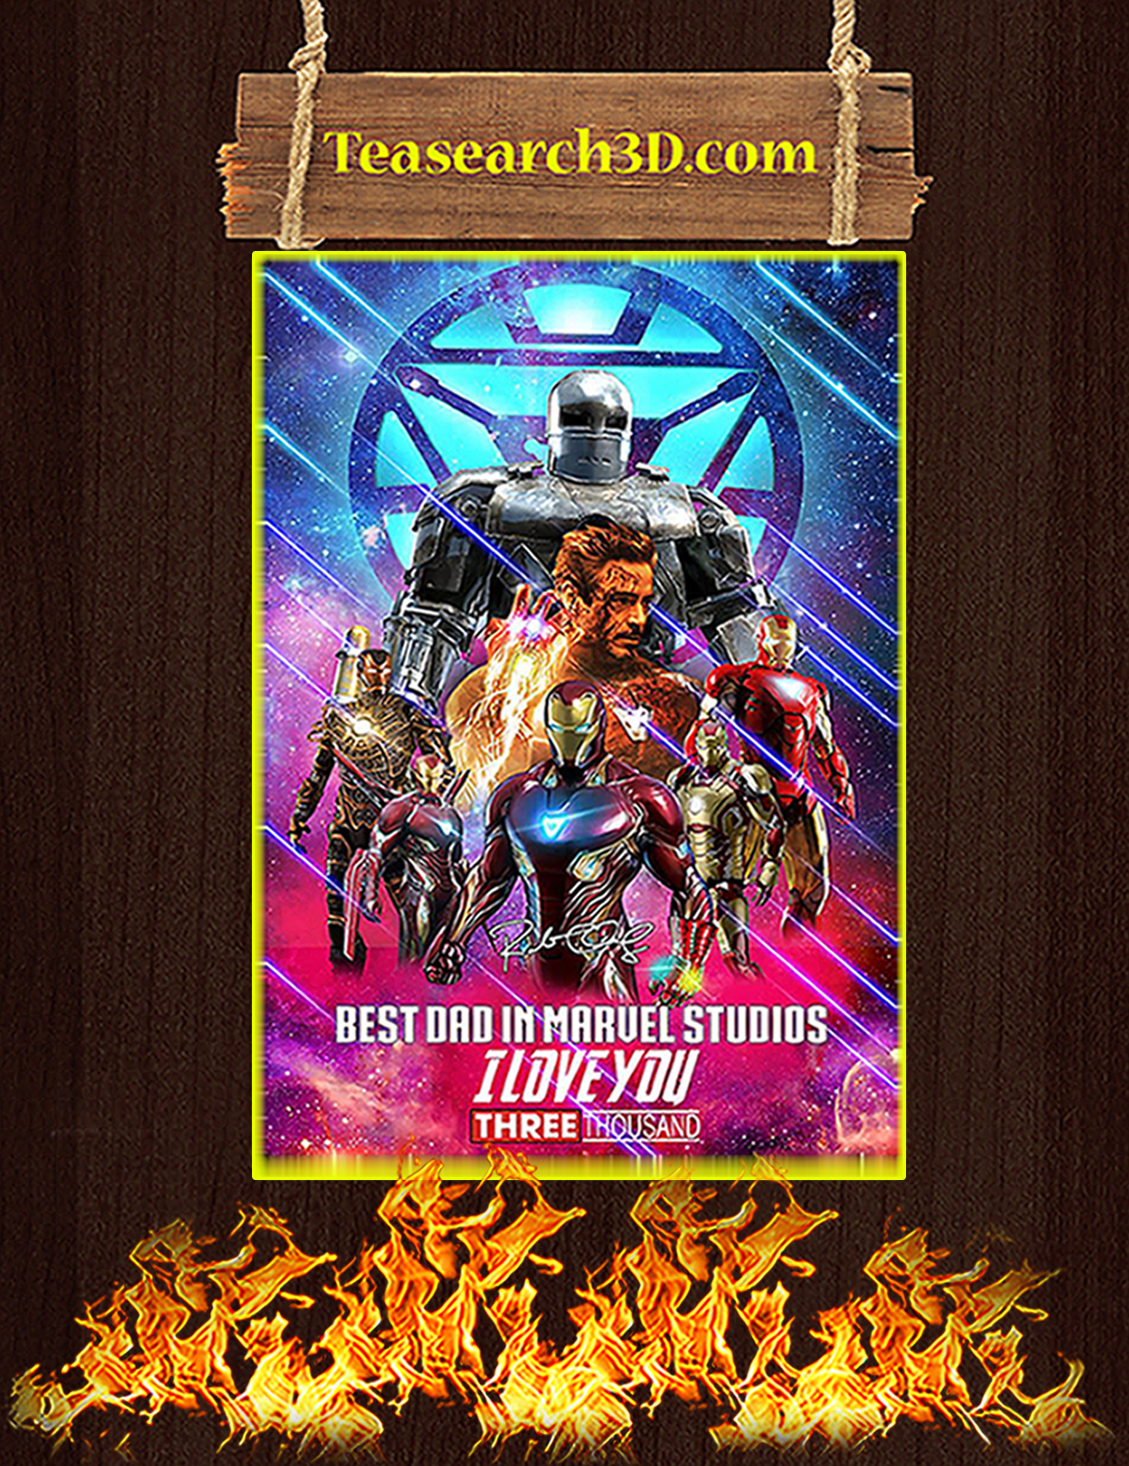 Iron man best dad in marvel studios signature poster A3